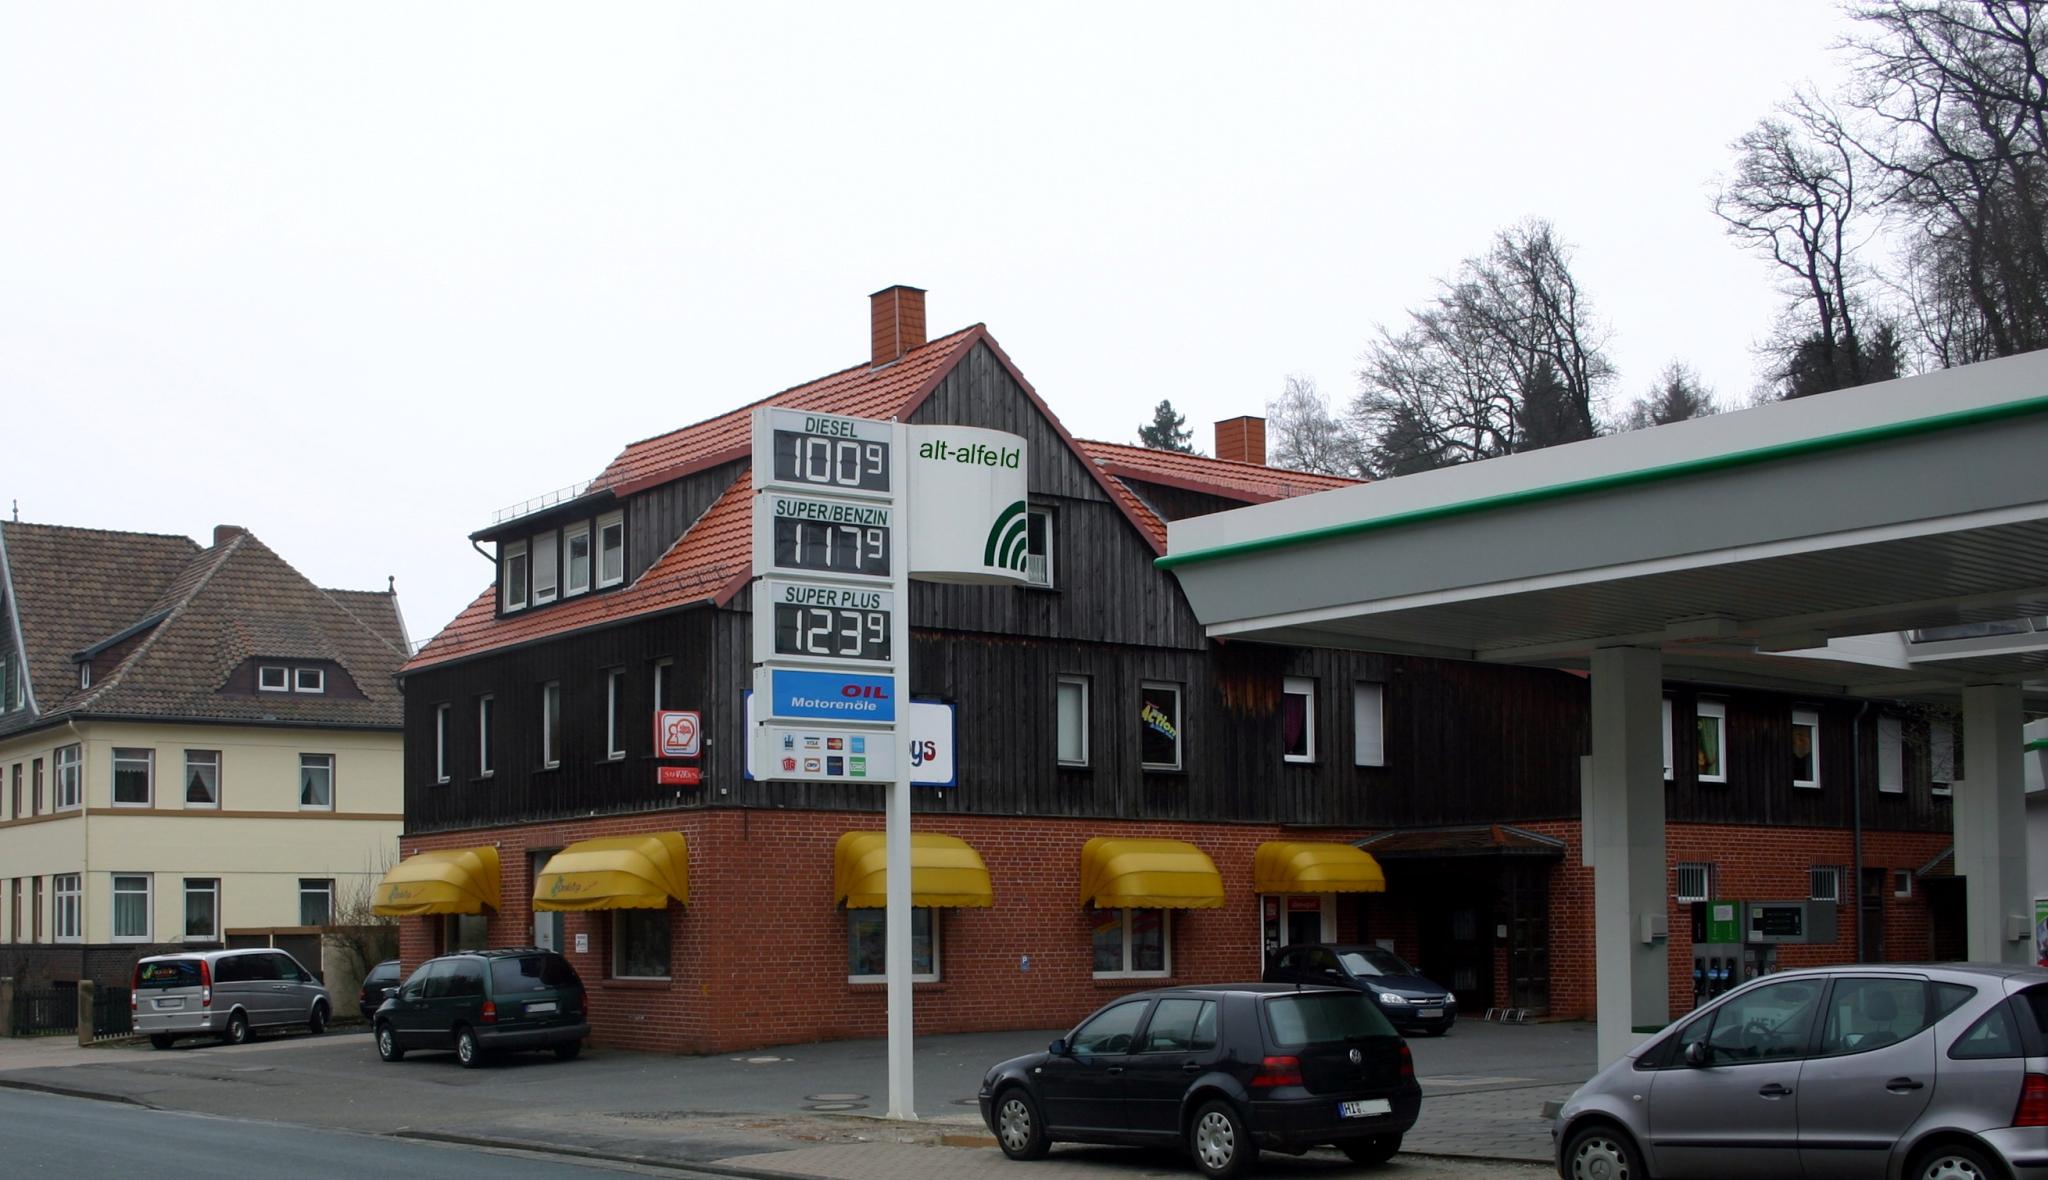 GöttingerStraße2009-01-Waldlust-Crocodile